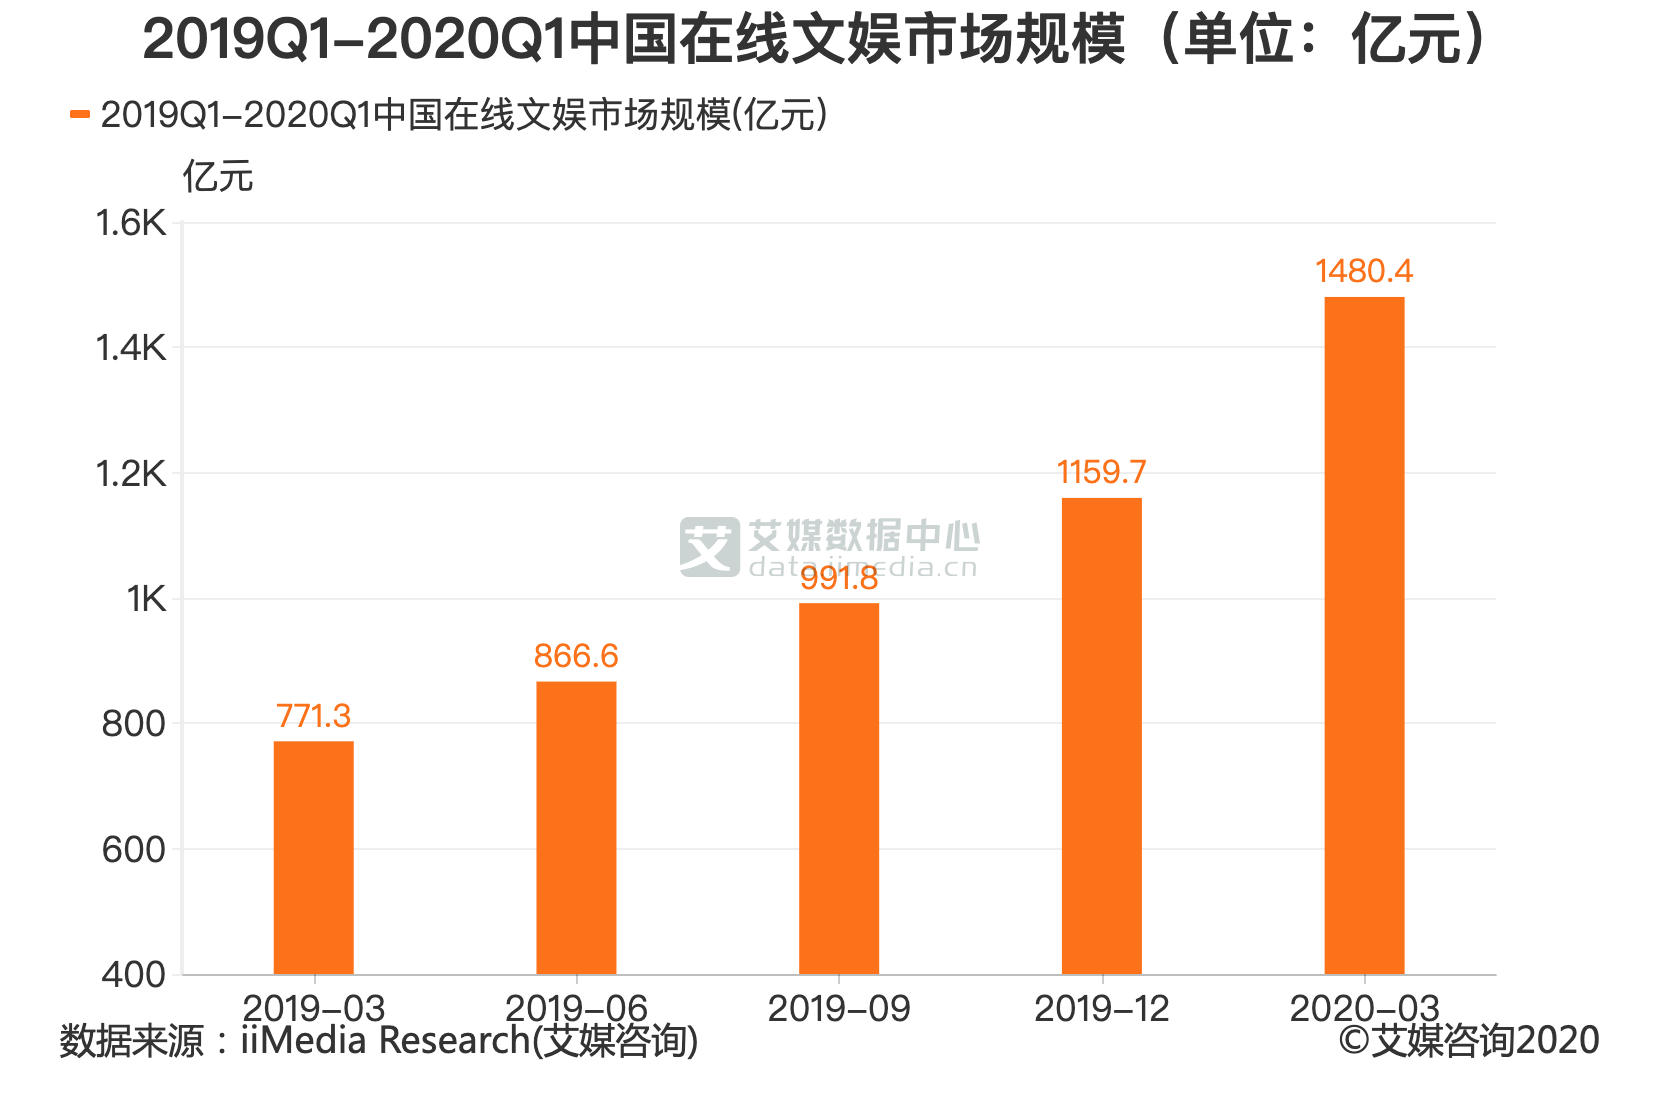 2019Q1-2020Q1中国在线文娱市场规模(单位:亿元)